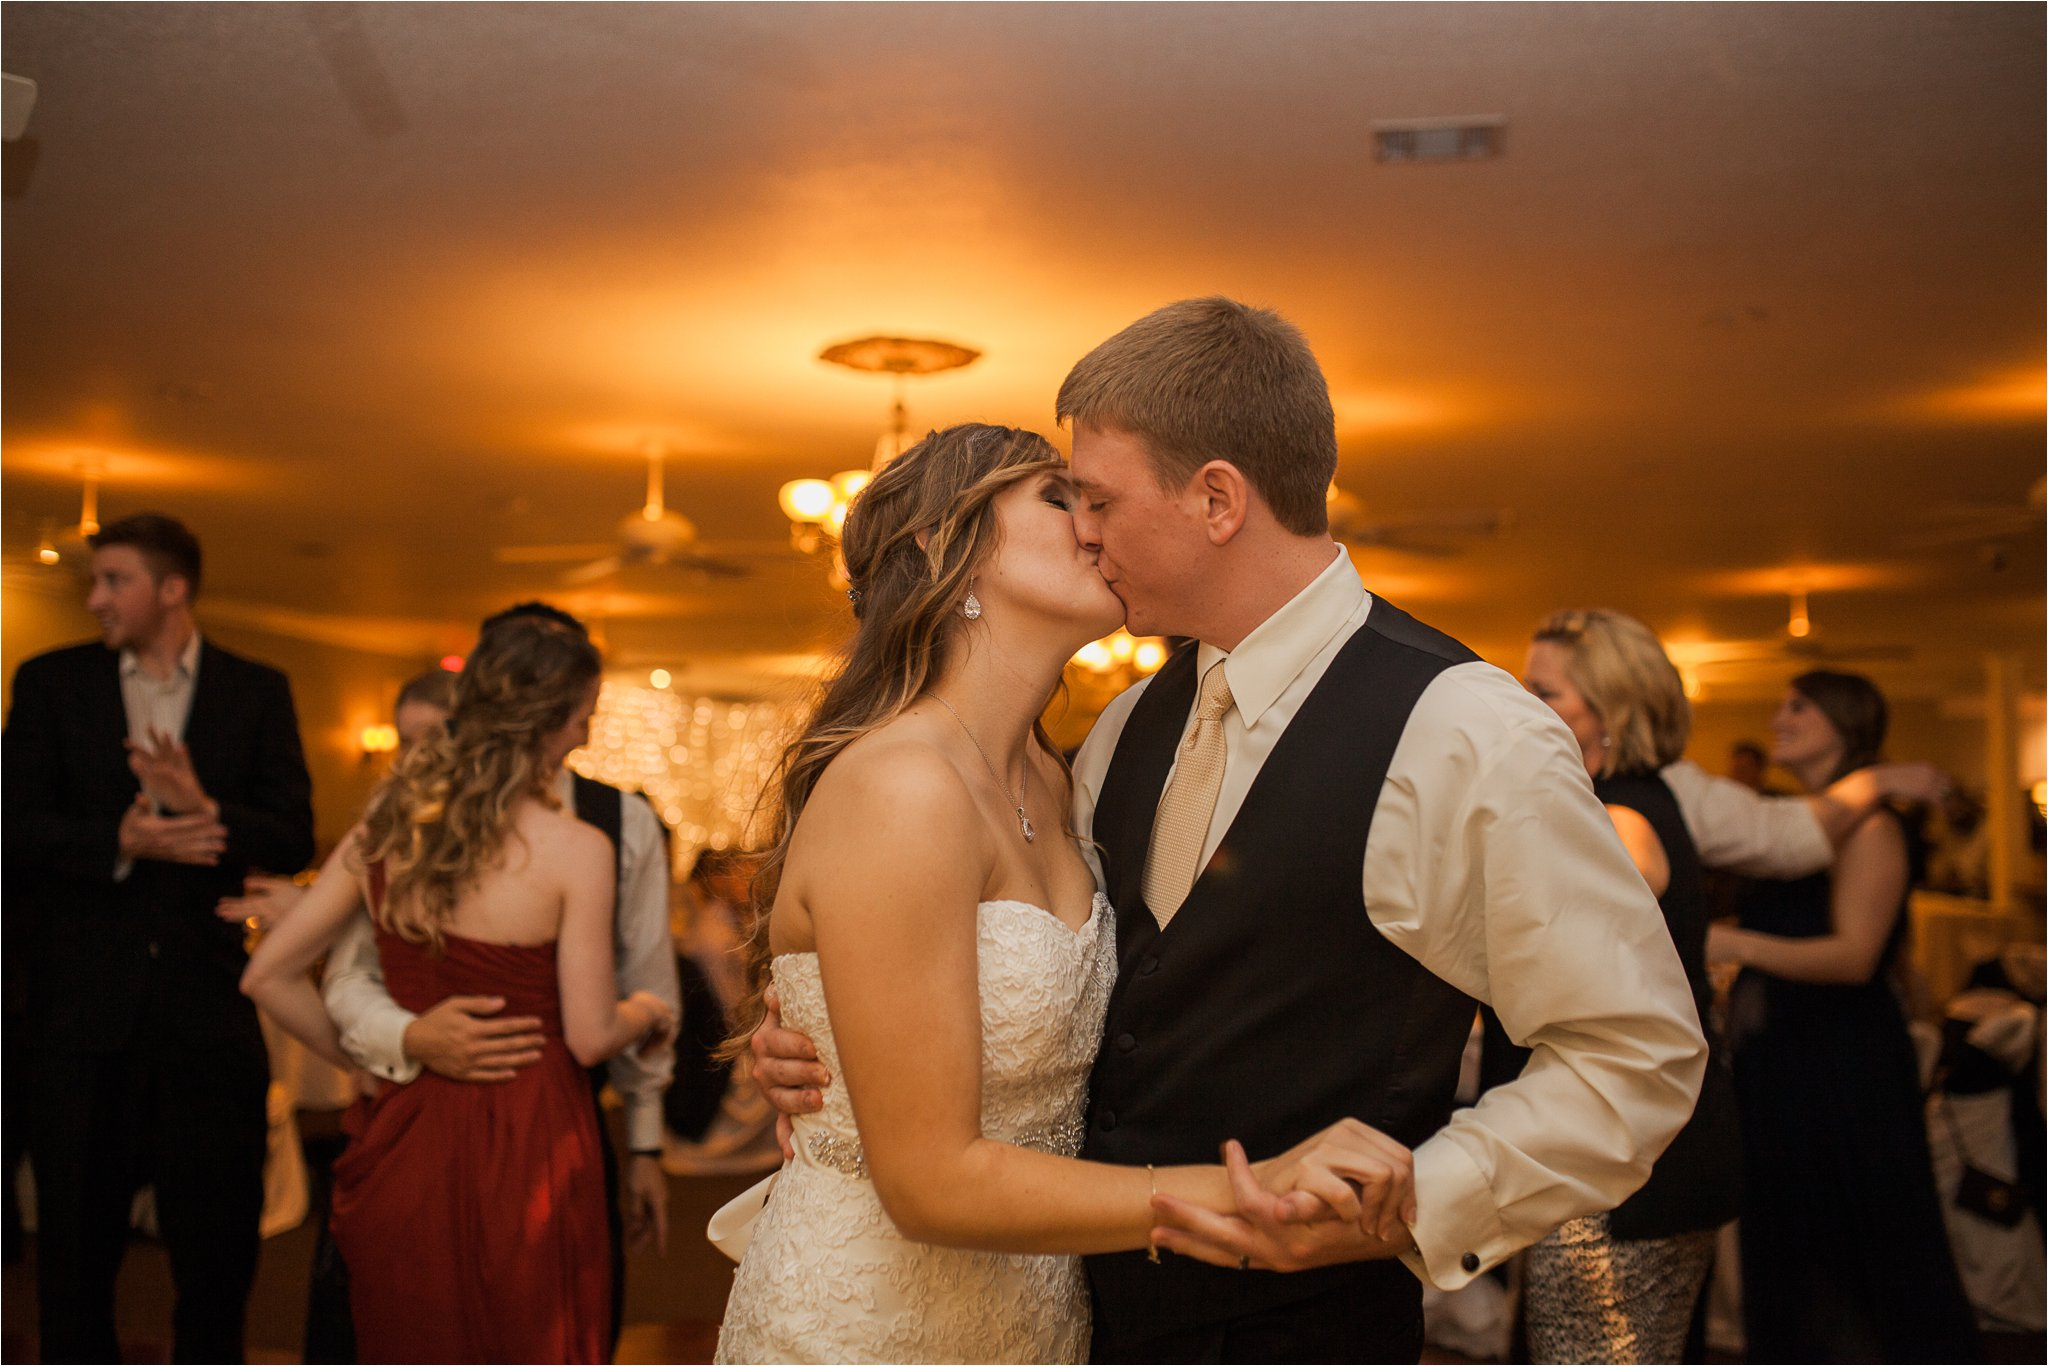 lunsford-wedding-999.jpg